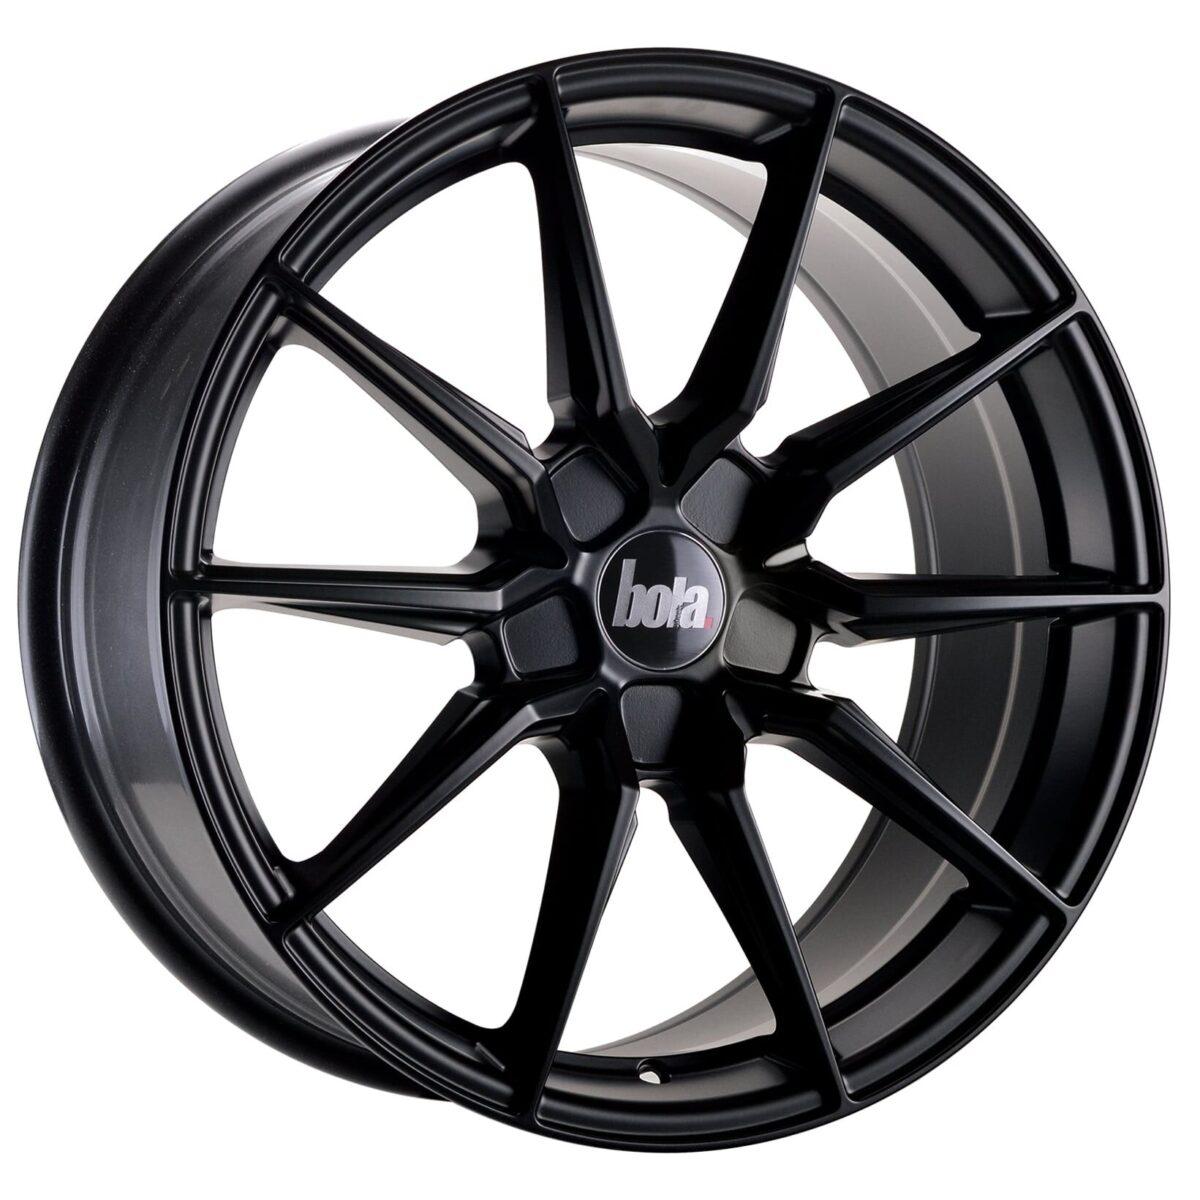 "19"" BOLA B16 Wheels - Matt Black - VW / Audi / Mercedes - 5x112"